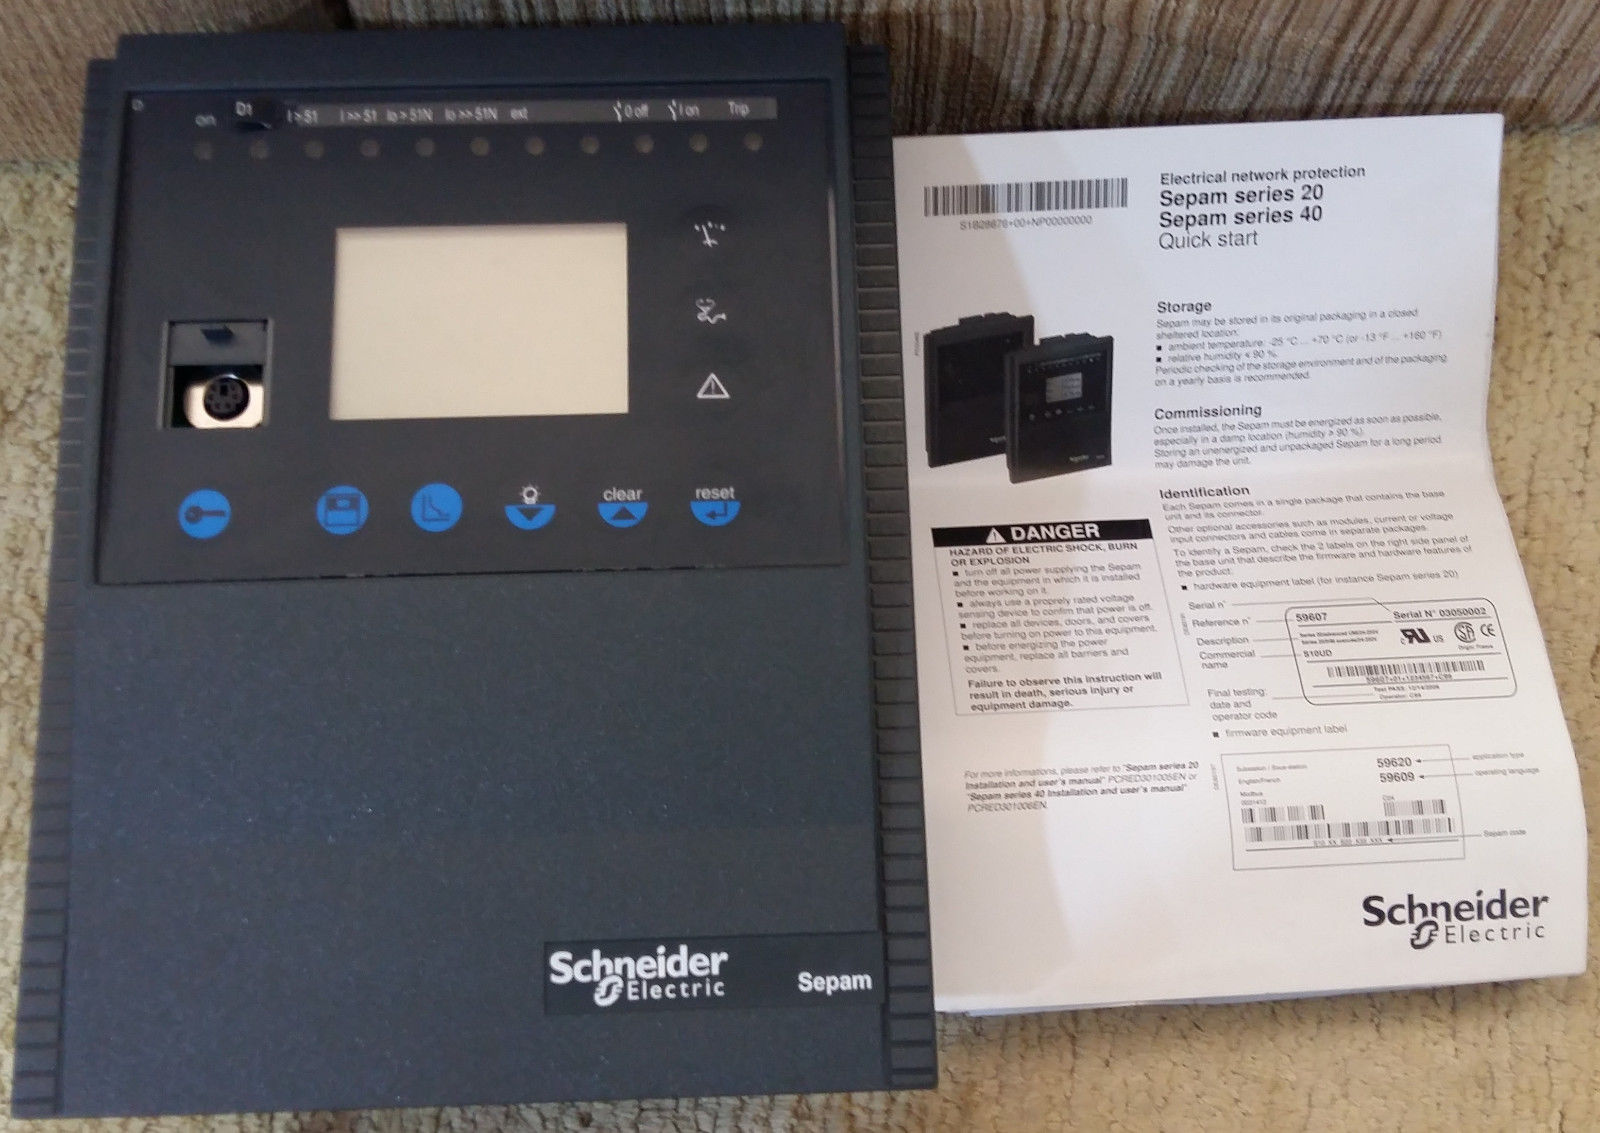 SCHNEIDER ELECTRIC SEPAM 59604 SERIES 40 S10 MD XXX JXX XNT